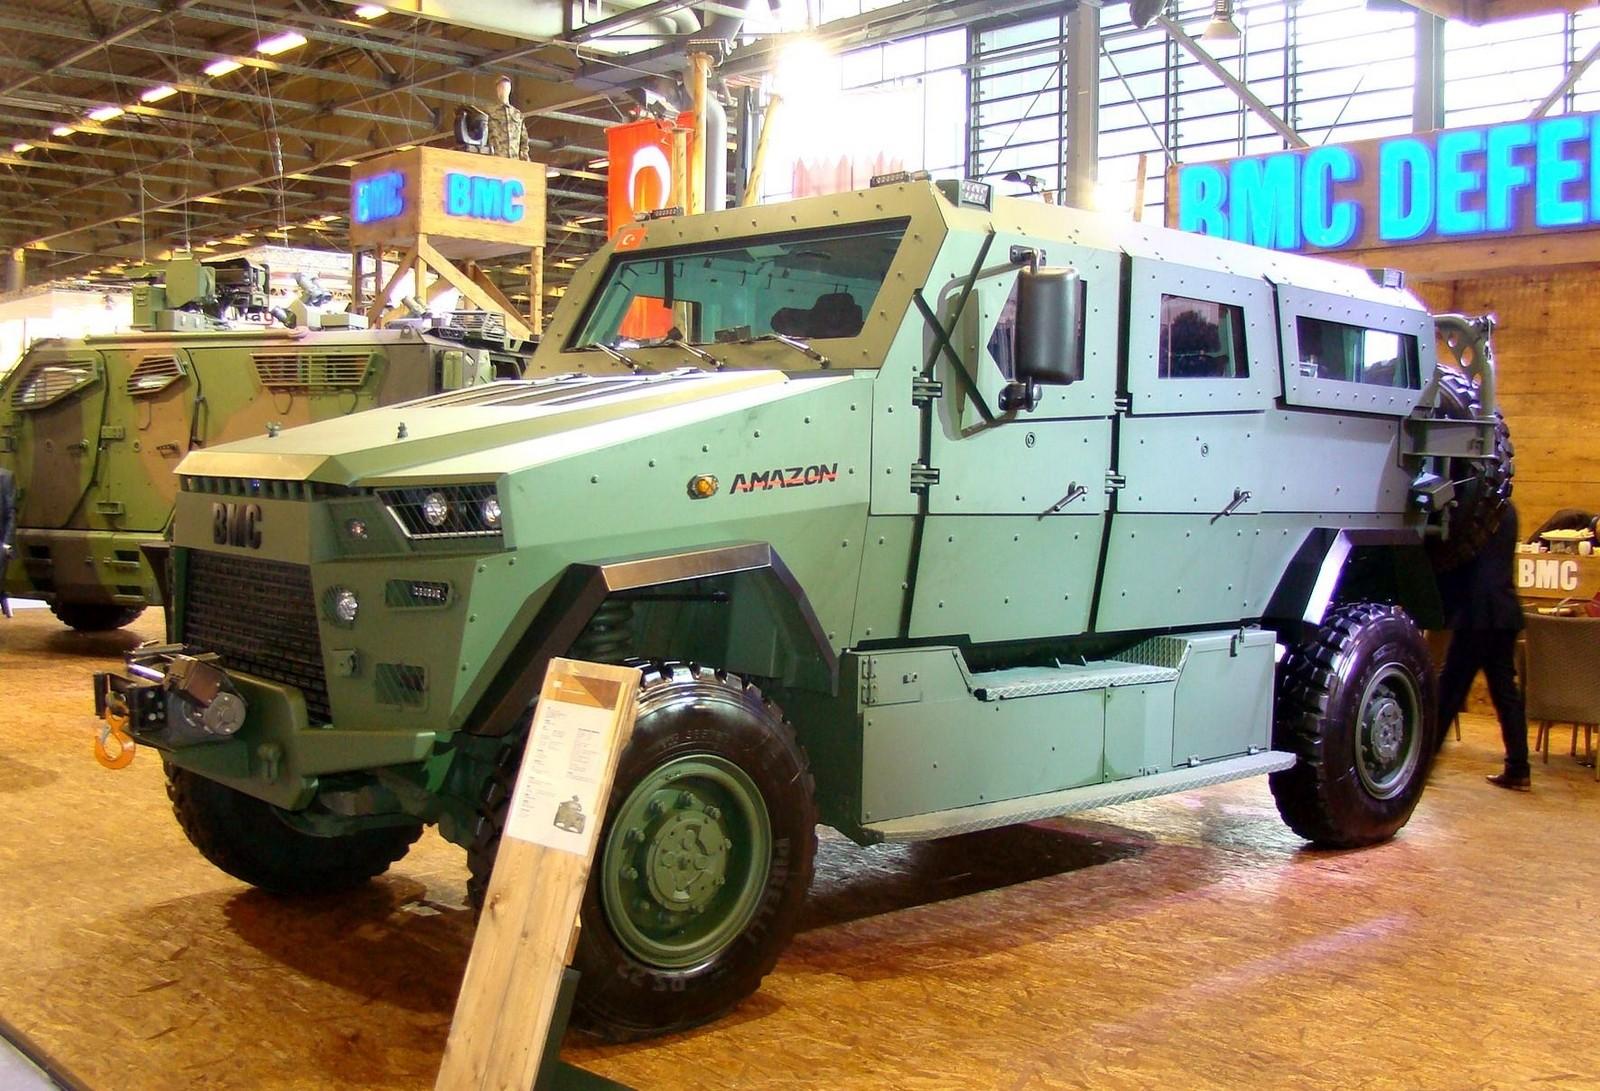 245-сильная боевая бронемашина ВМС Amazon на салоне Eurosatory-2016